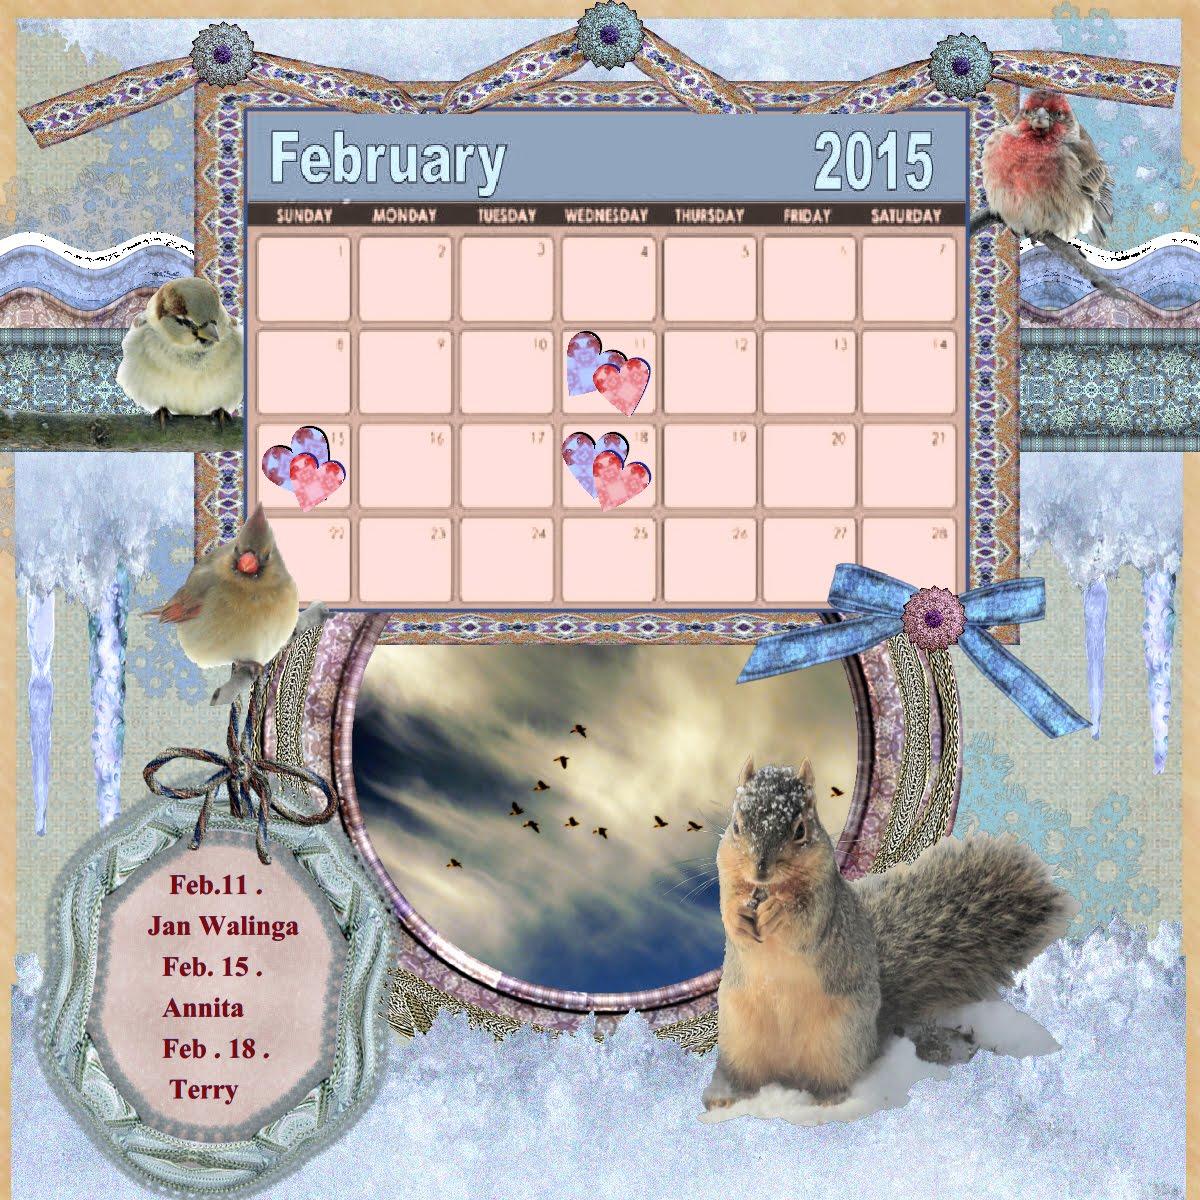 Nelleke's Feb 15 calendar